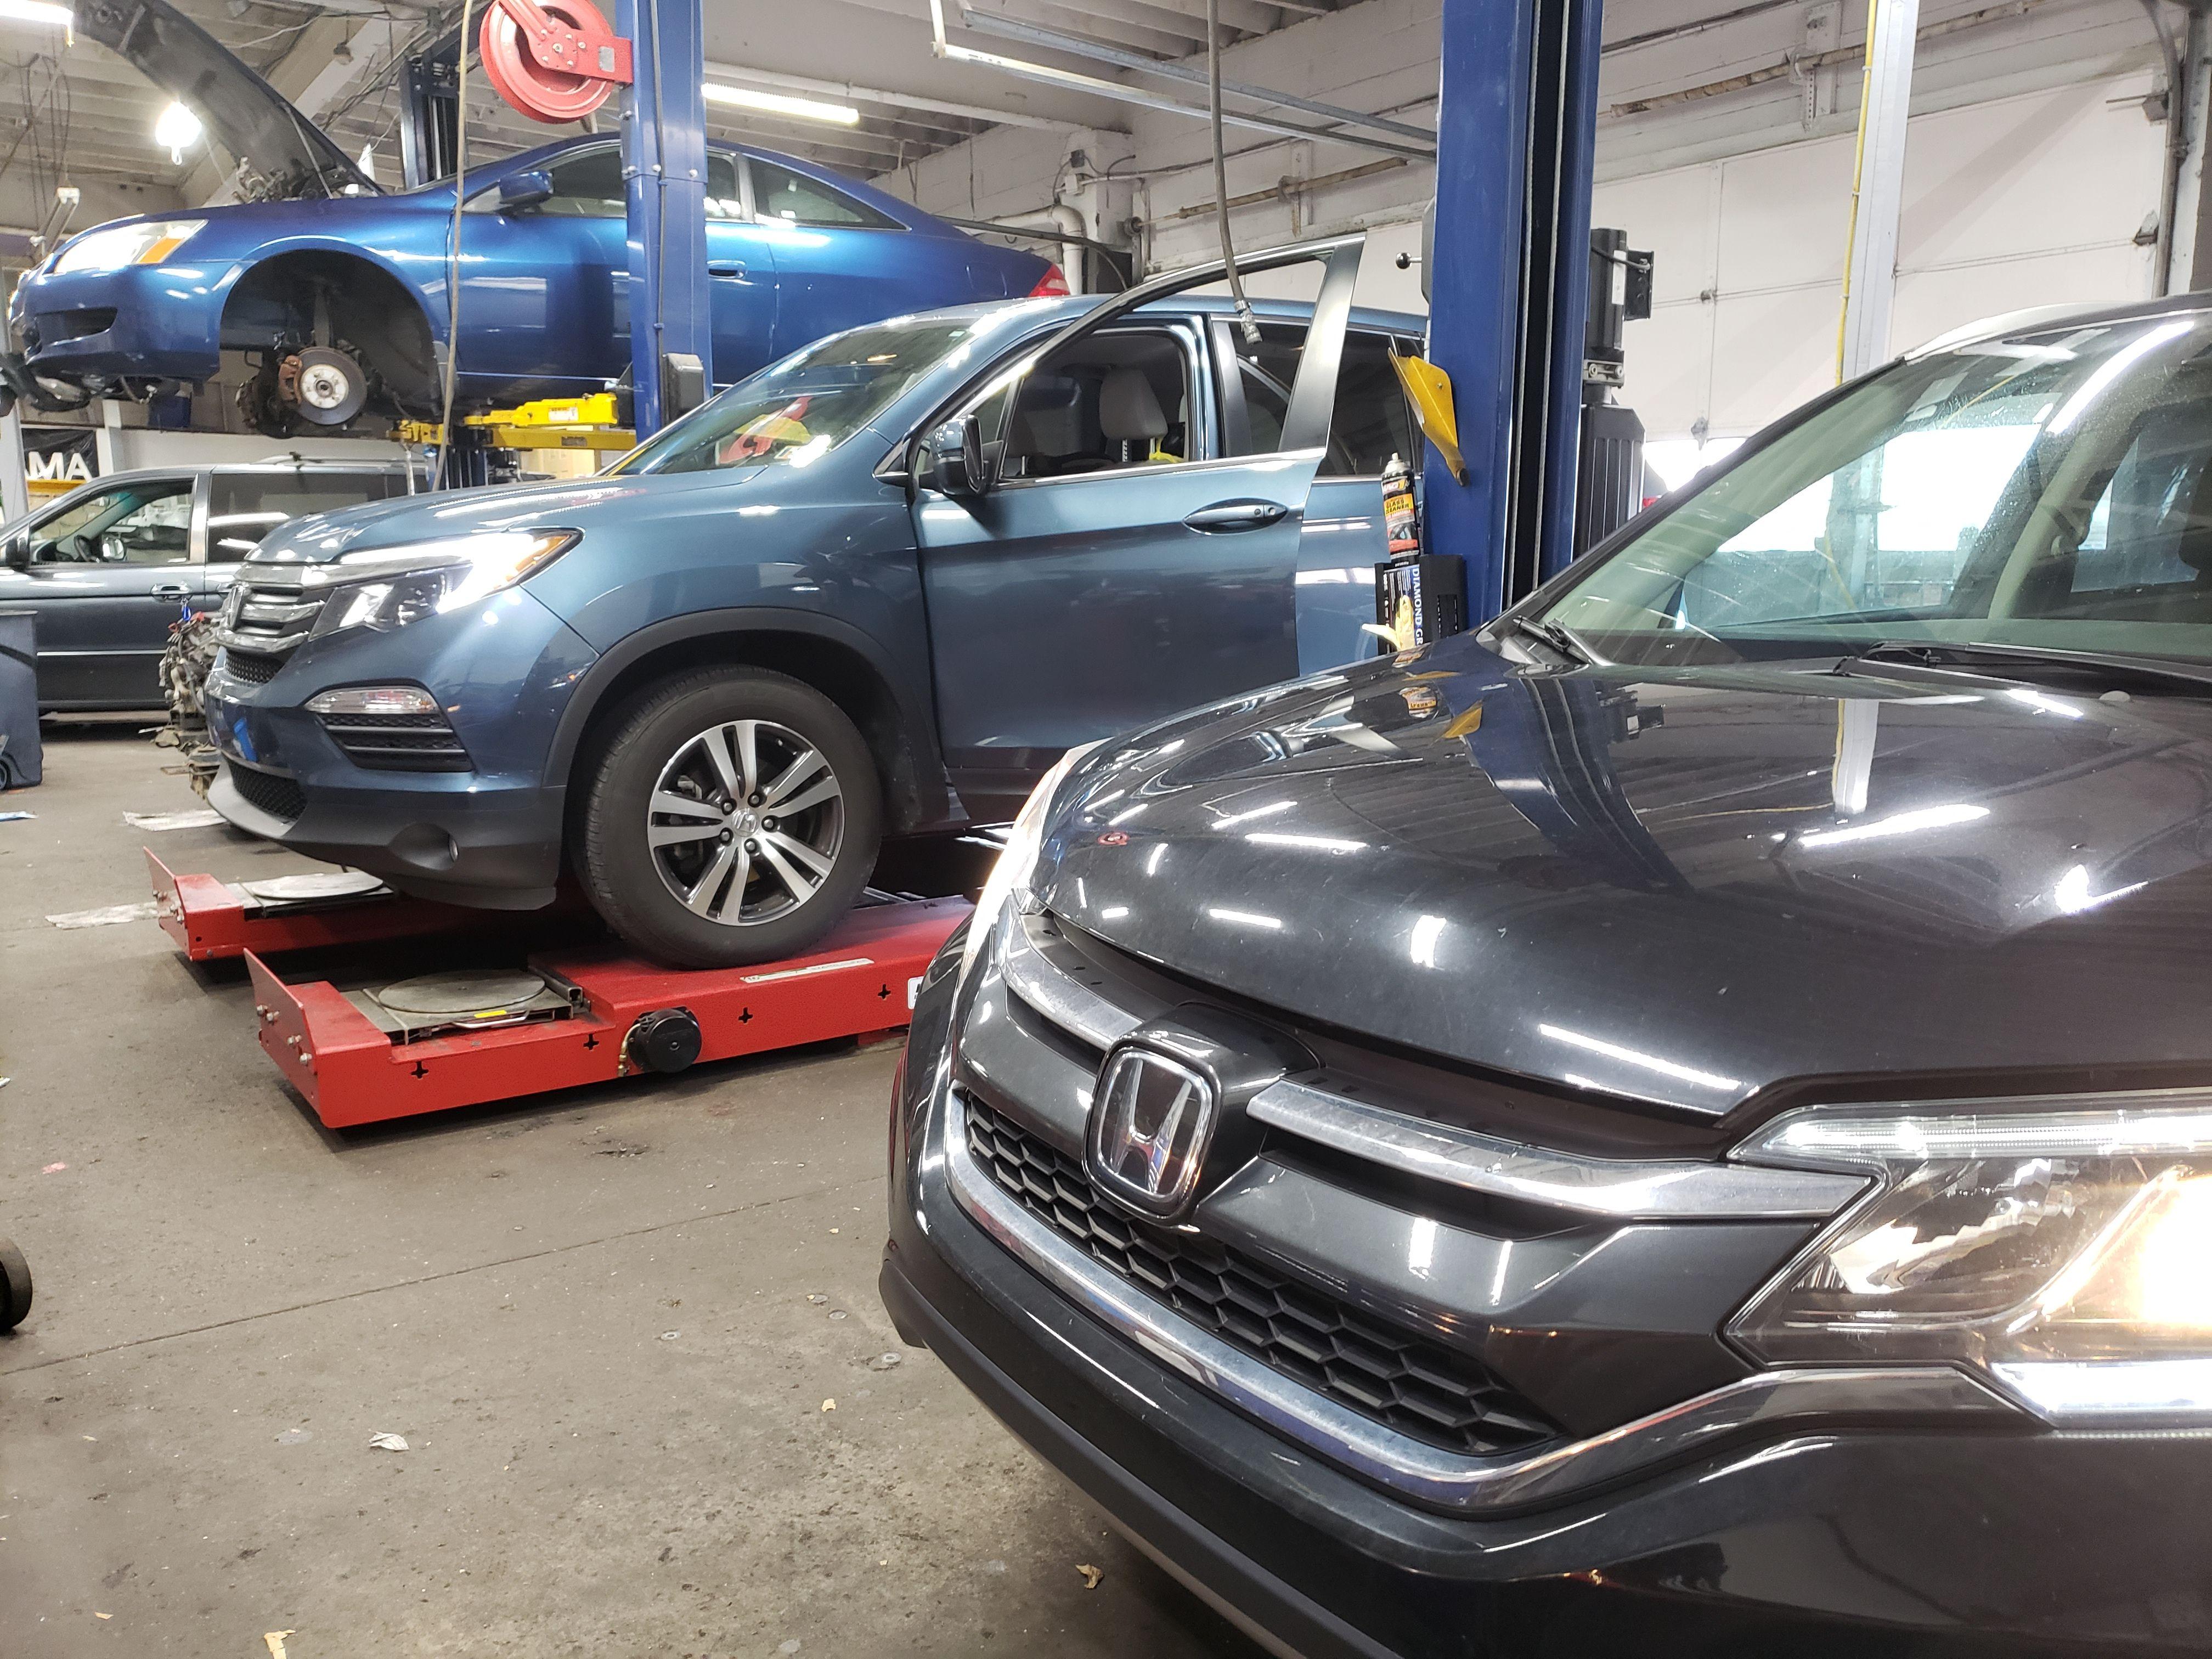 Pin By Chi Auto Repair On Honda Acura Service Repair In Philadelphia Pa Car Repair Service Honda Acura